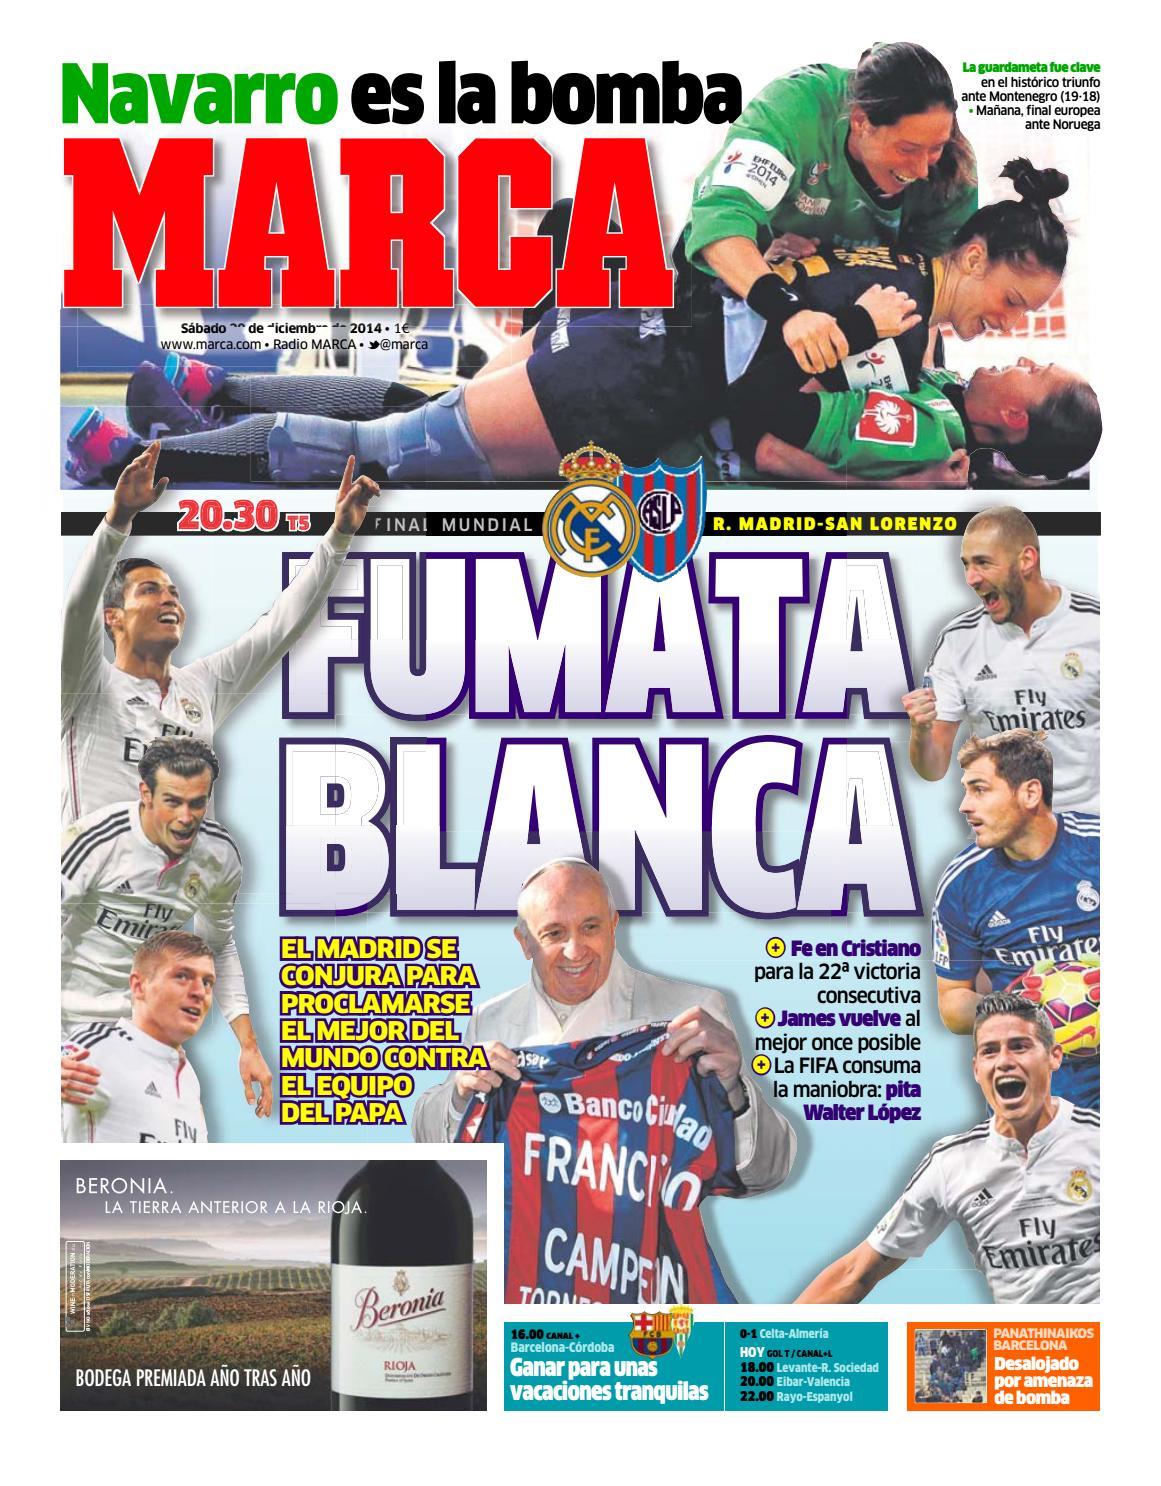 Marca 20141220 By Juan Carlos Matos Costa Issuu